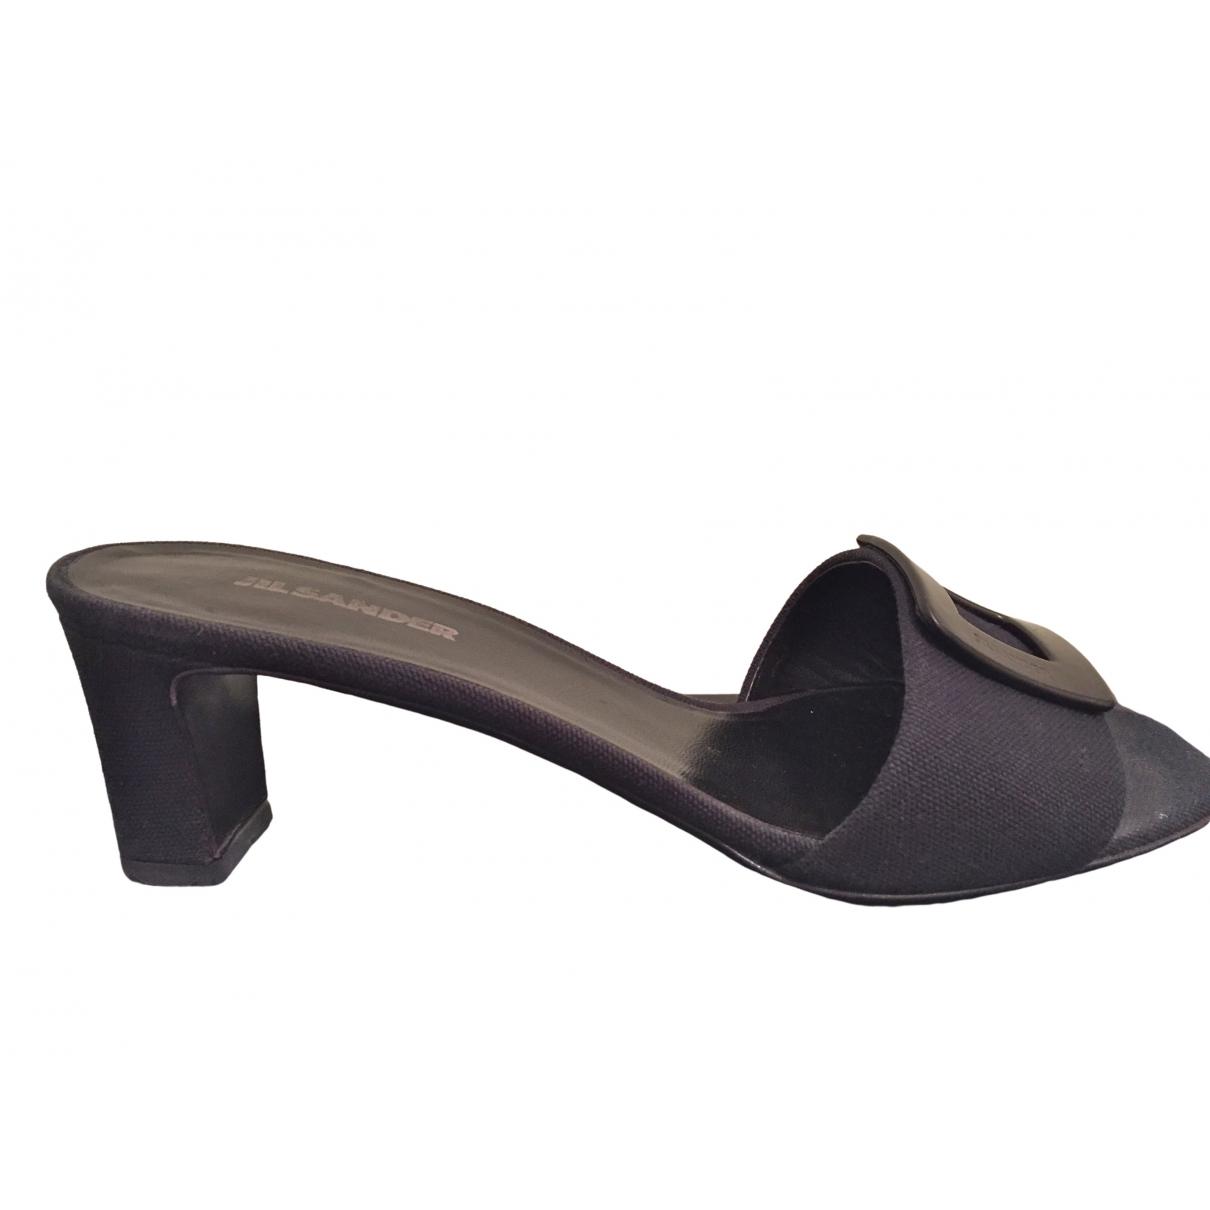 Jil Sander \N Black Cloth Sandals for Women 39 EU